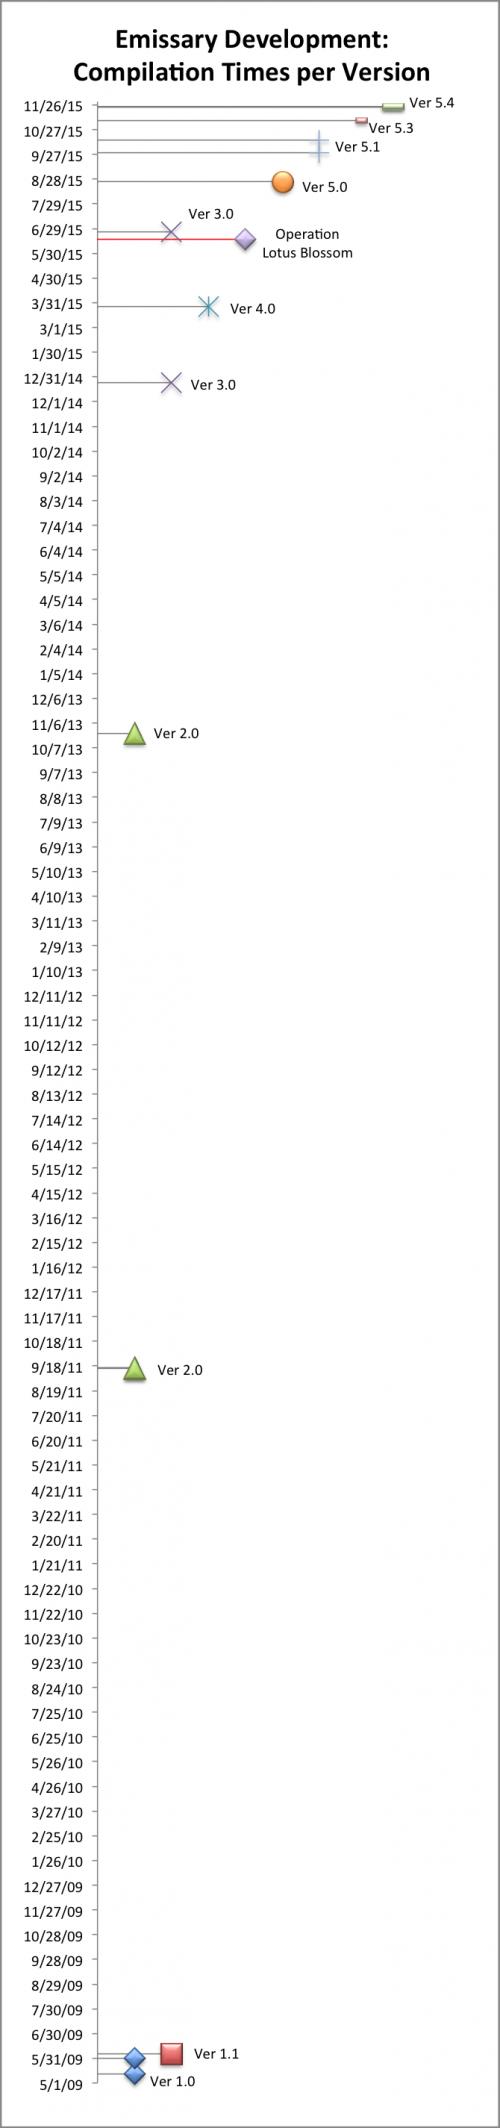 emissary_compilation_timeline_with_olb_vertical